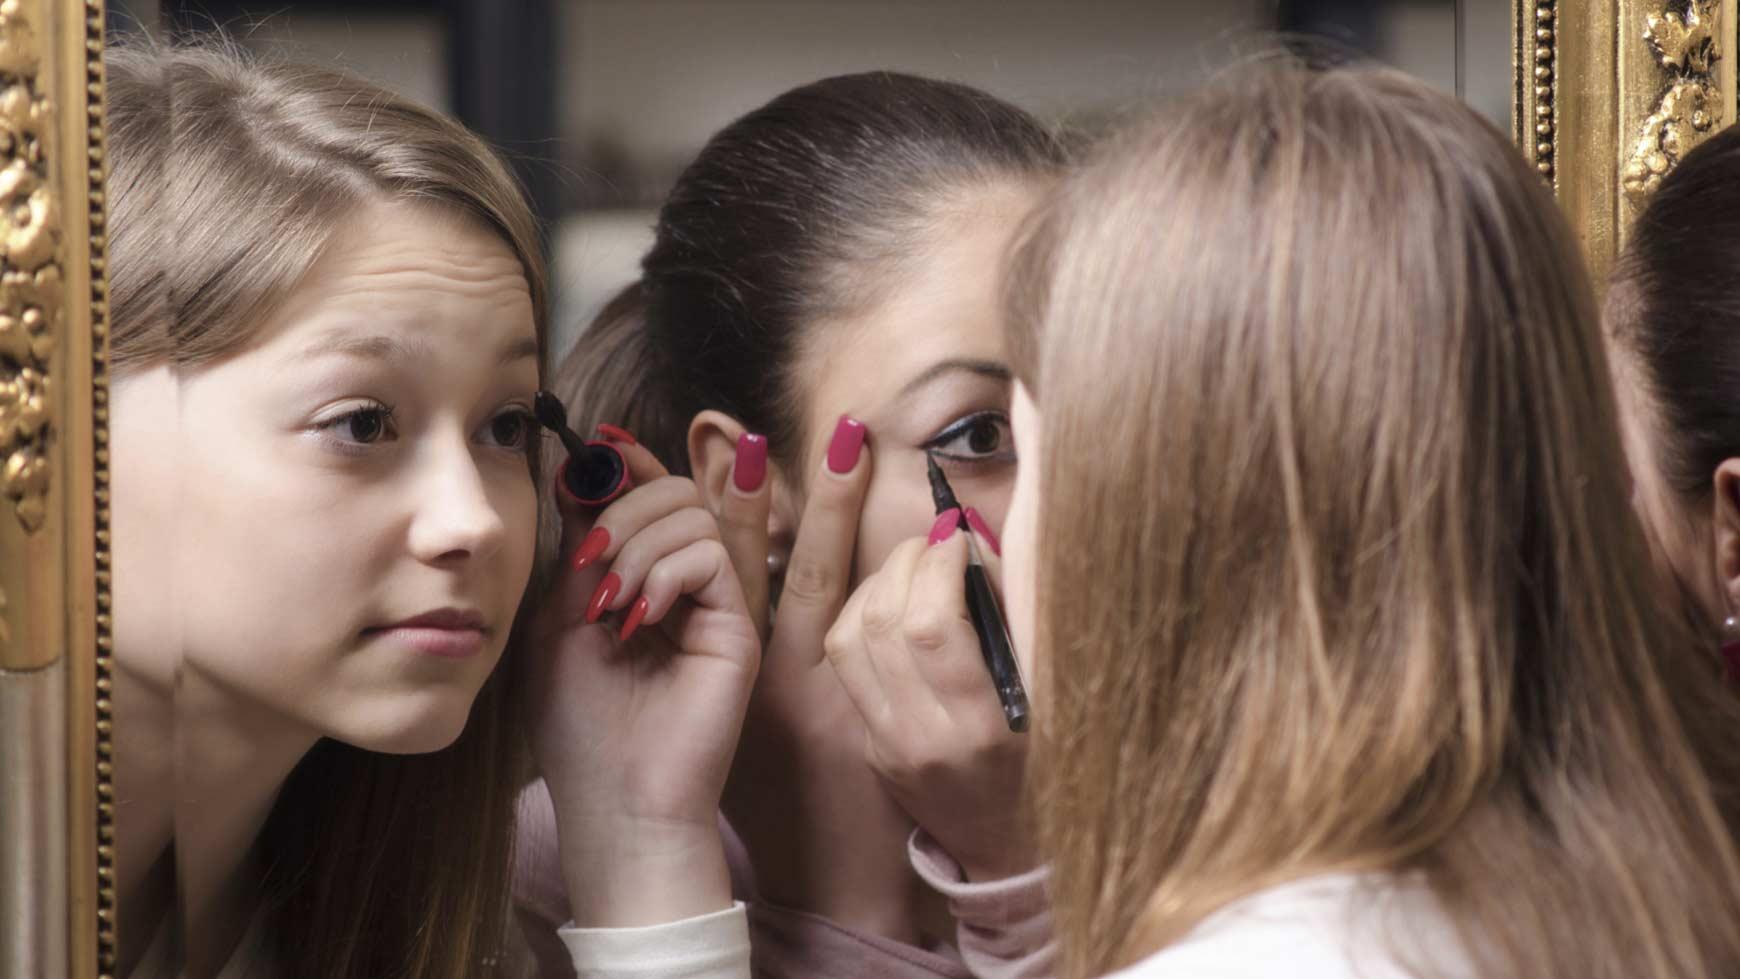 problemen dating iemand met ADHD Dating perfectionisme